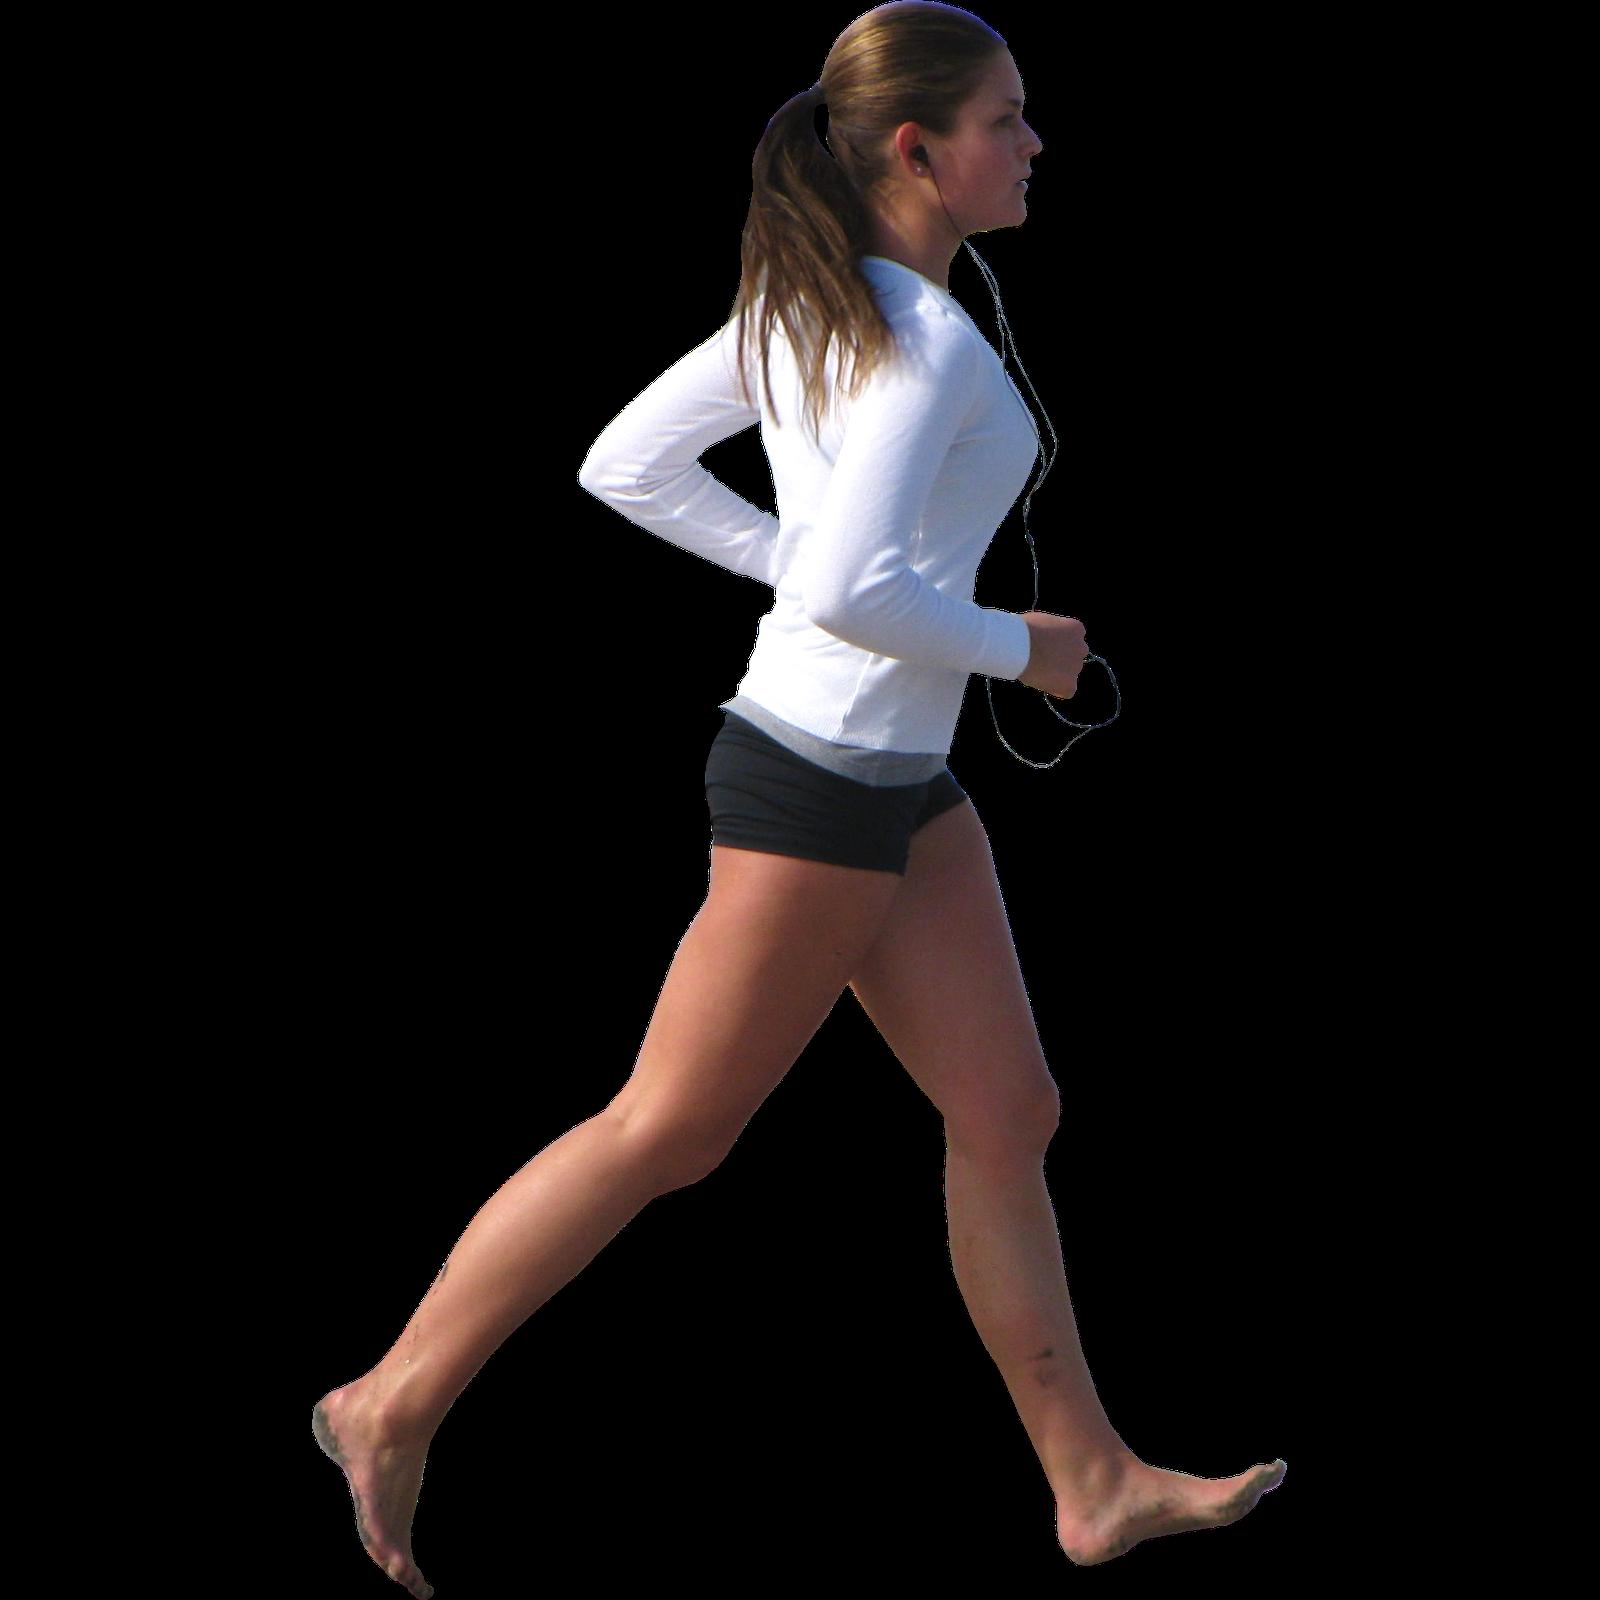 Woman Jogging PNG - 51232